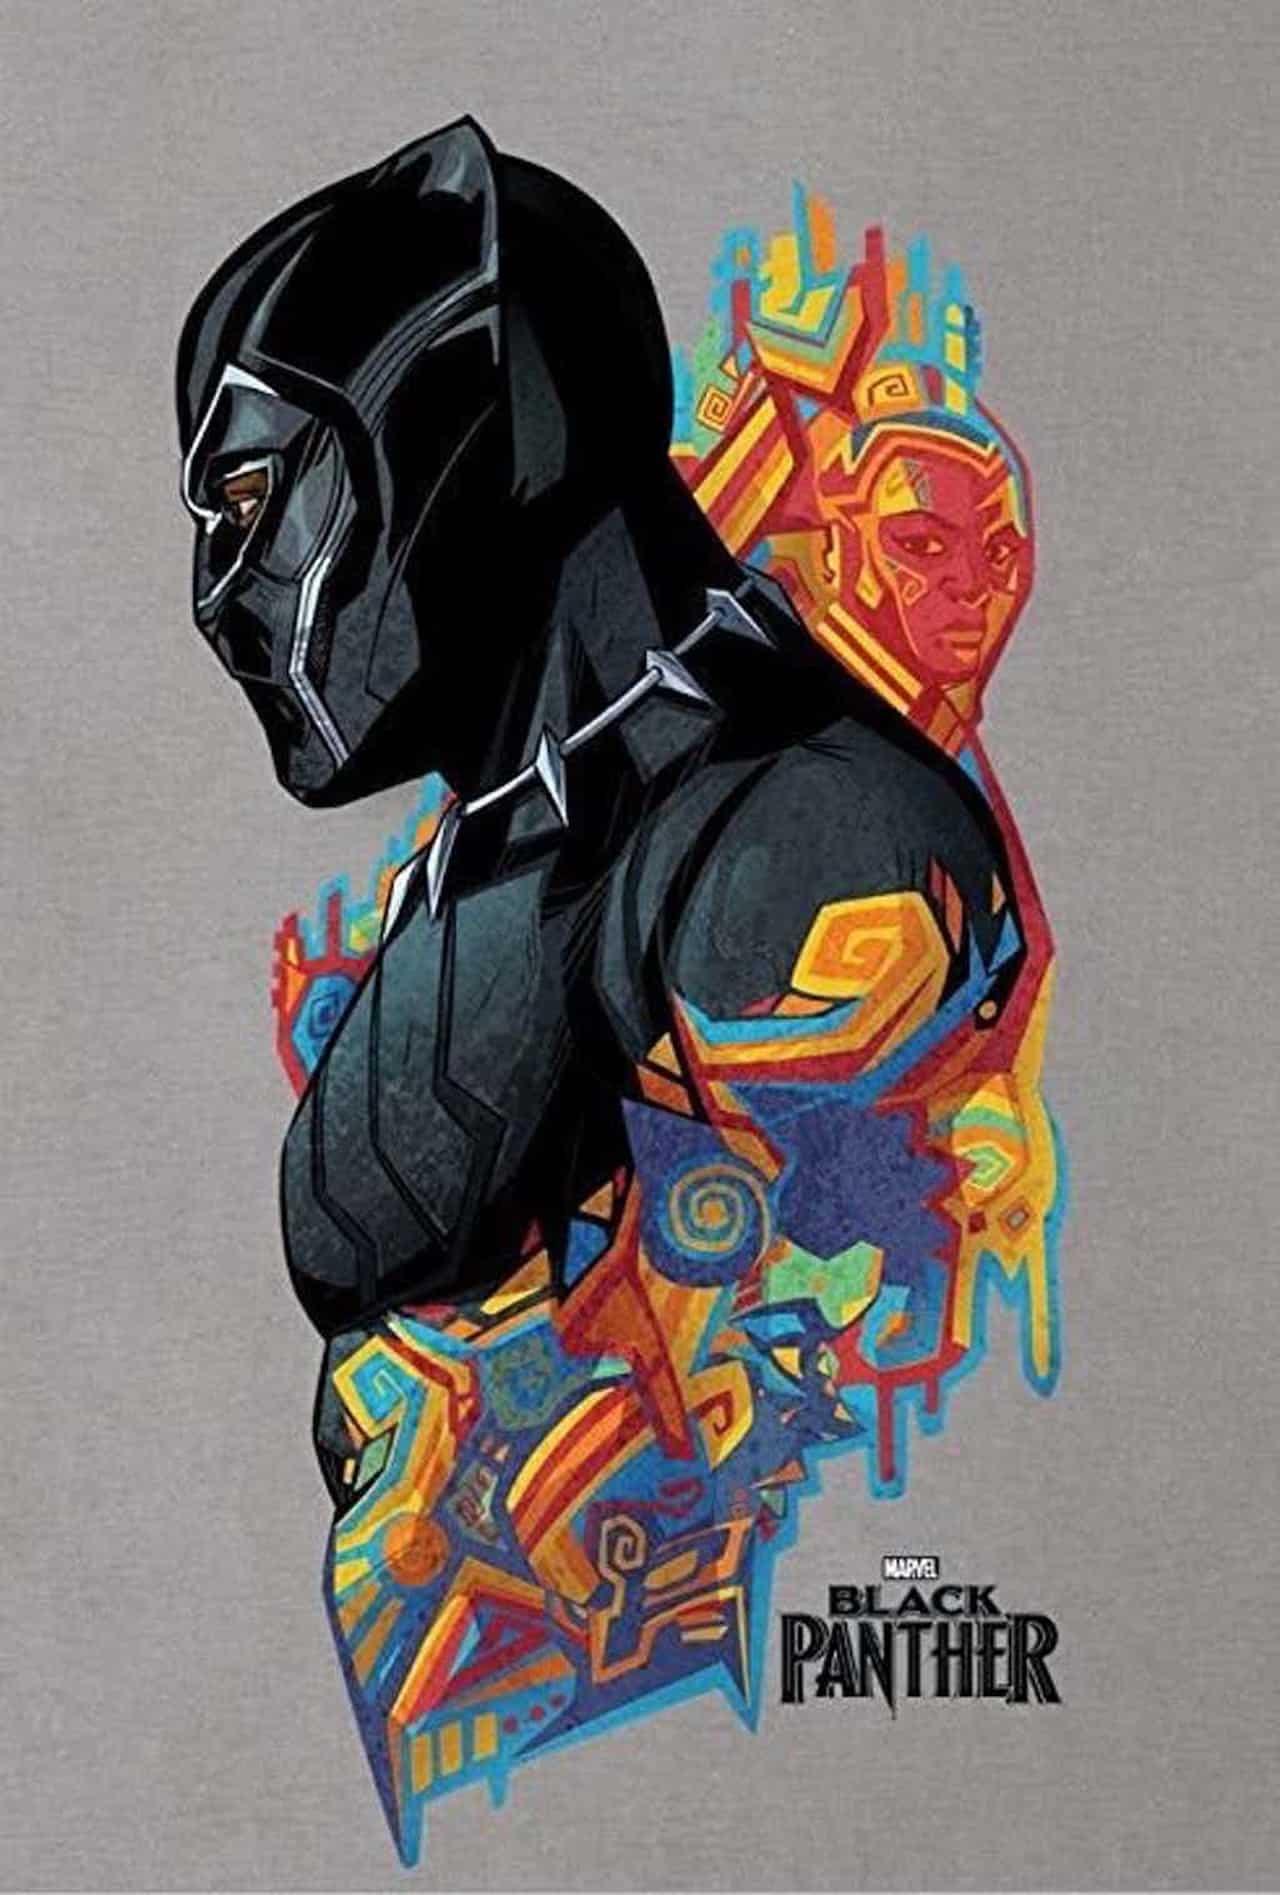 Black Panther Cinematographe